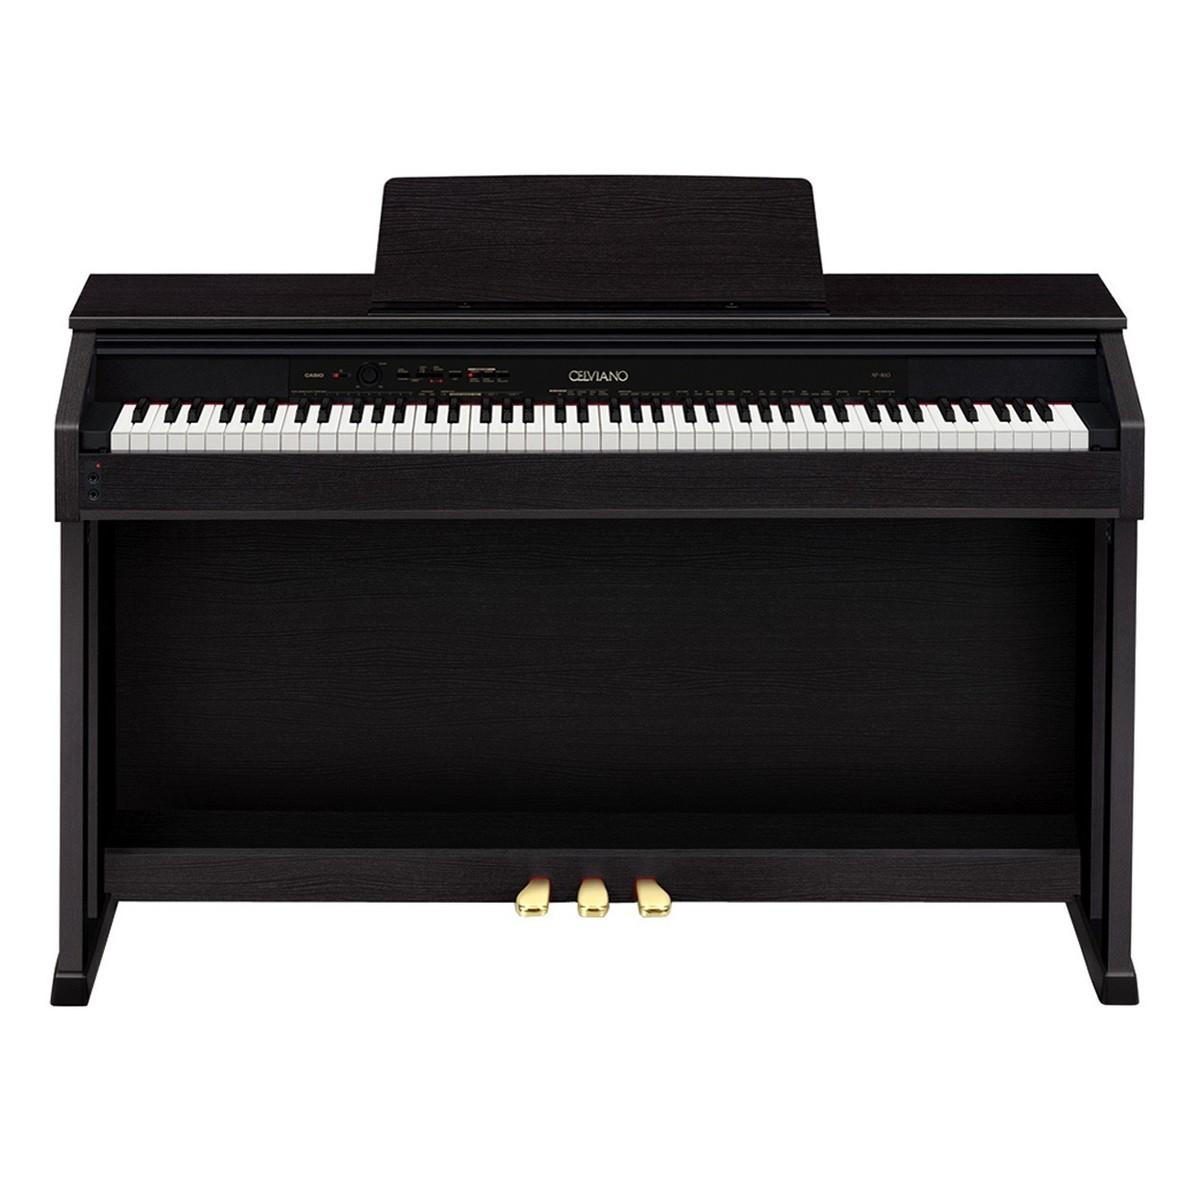 casio celviano ap 460 digital piano at. Black Bedroom Furniture Sets. Home Design Ideas